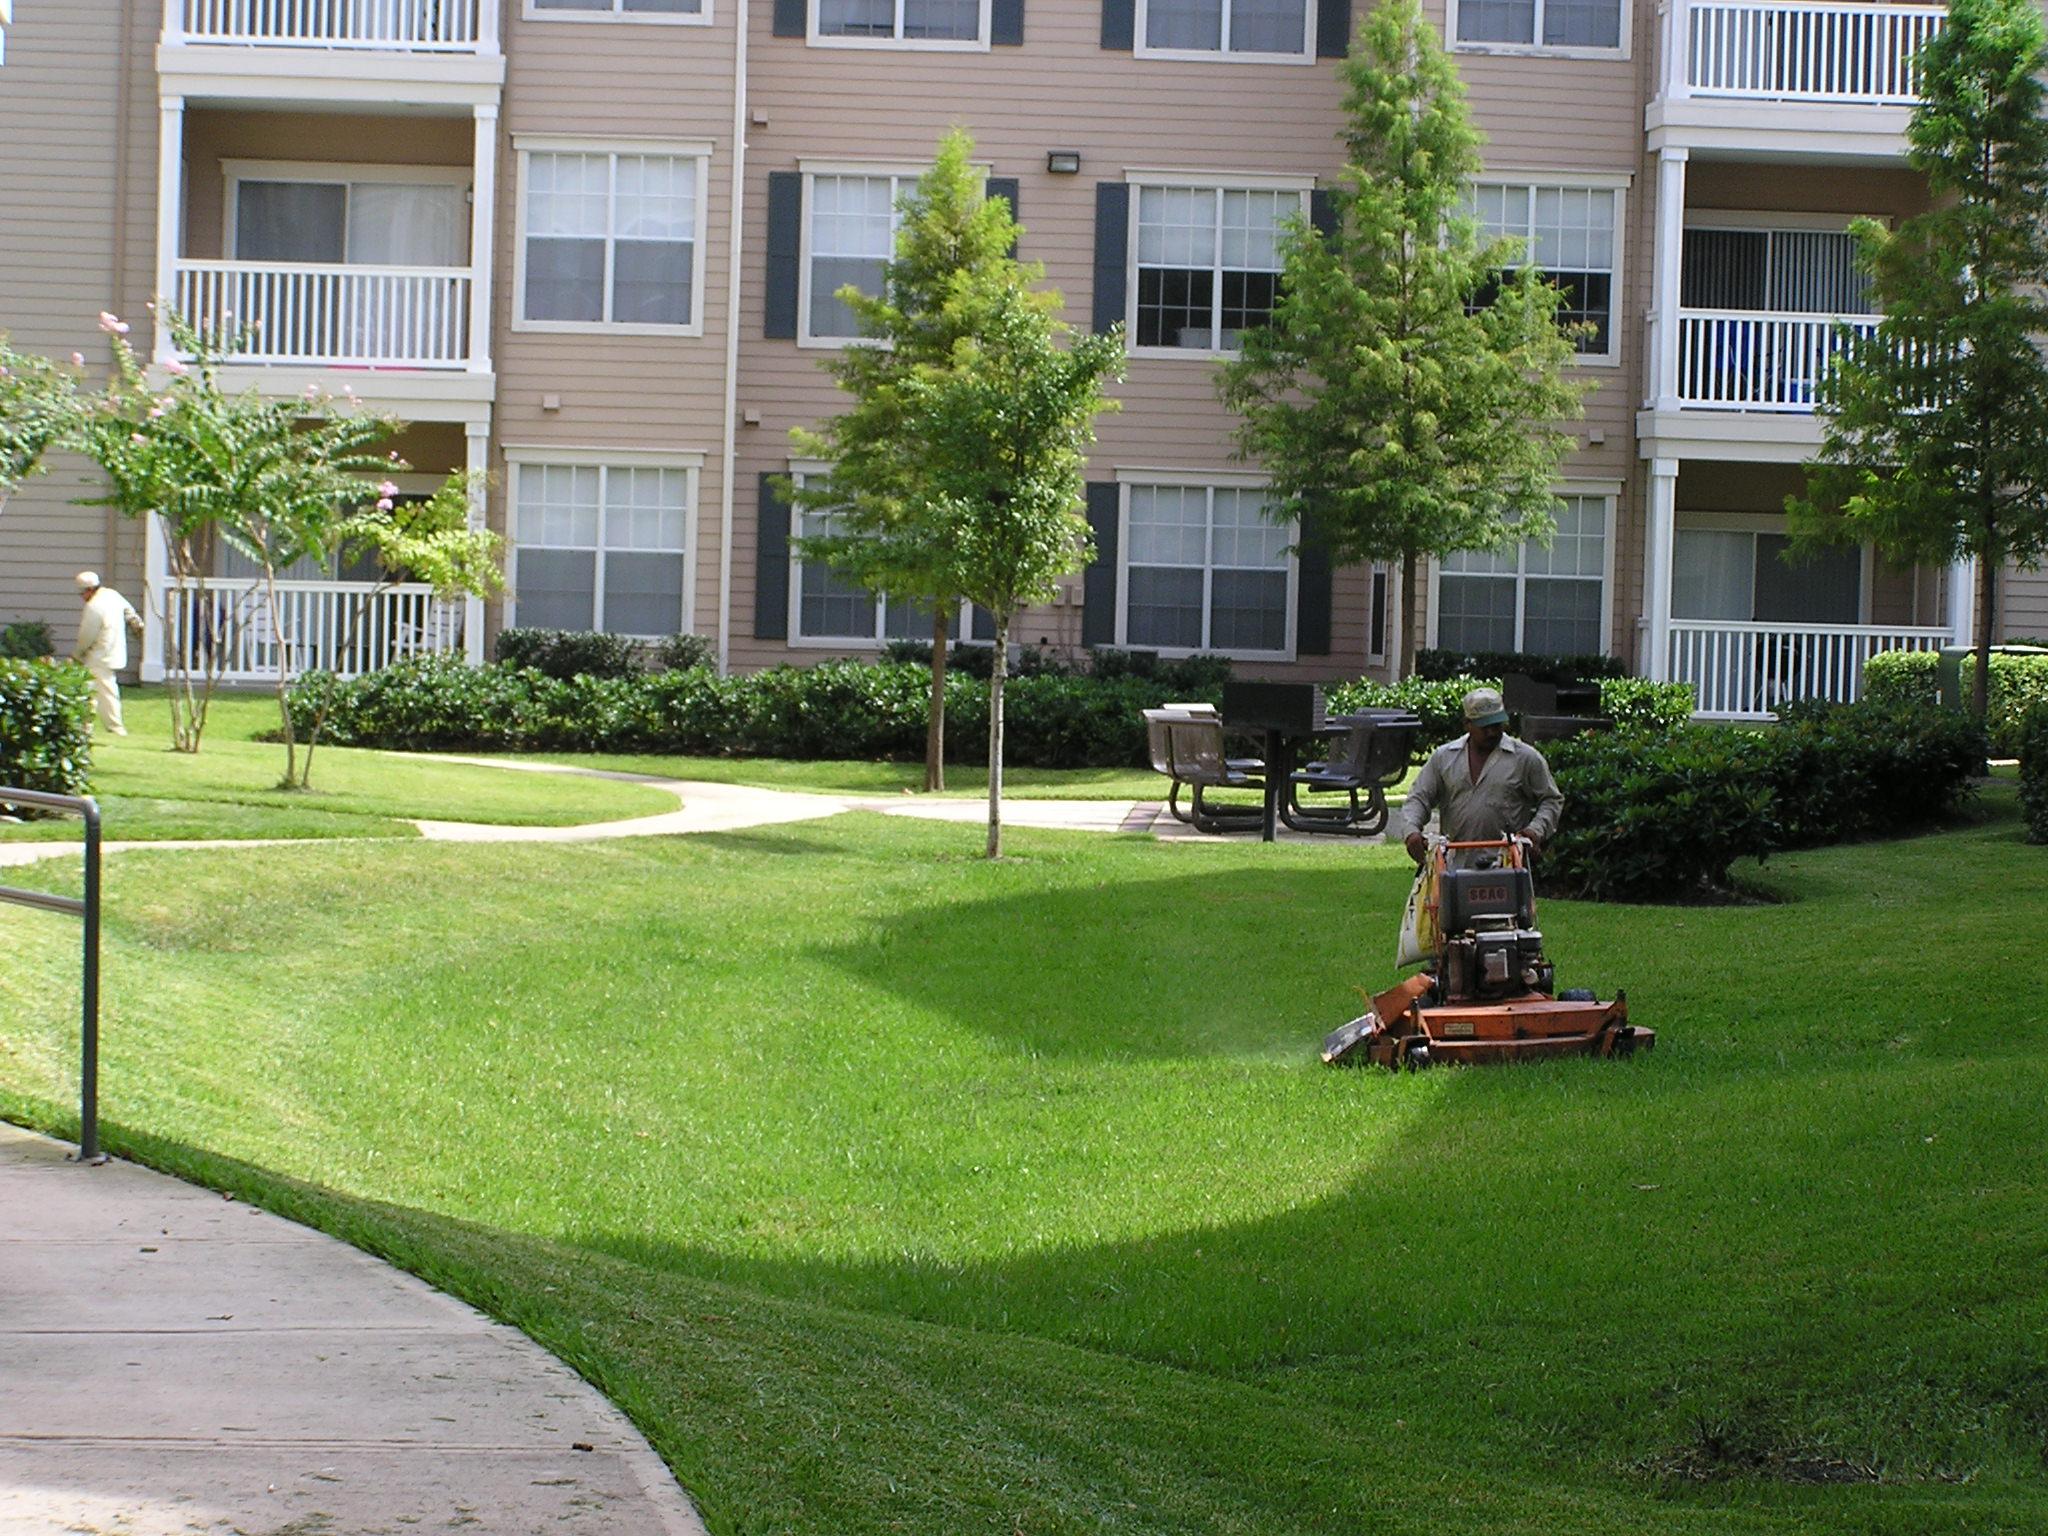 V s landscape maintenance in loxahatchee fl 33470 for Landscape maintenance